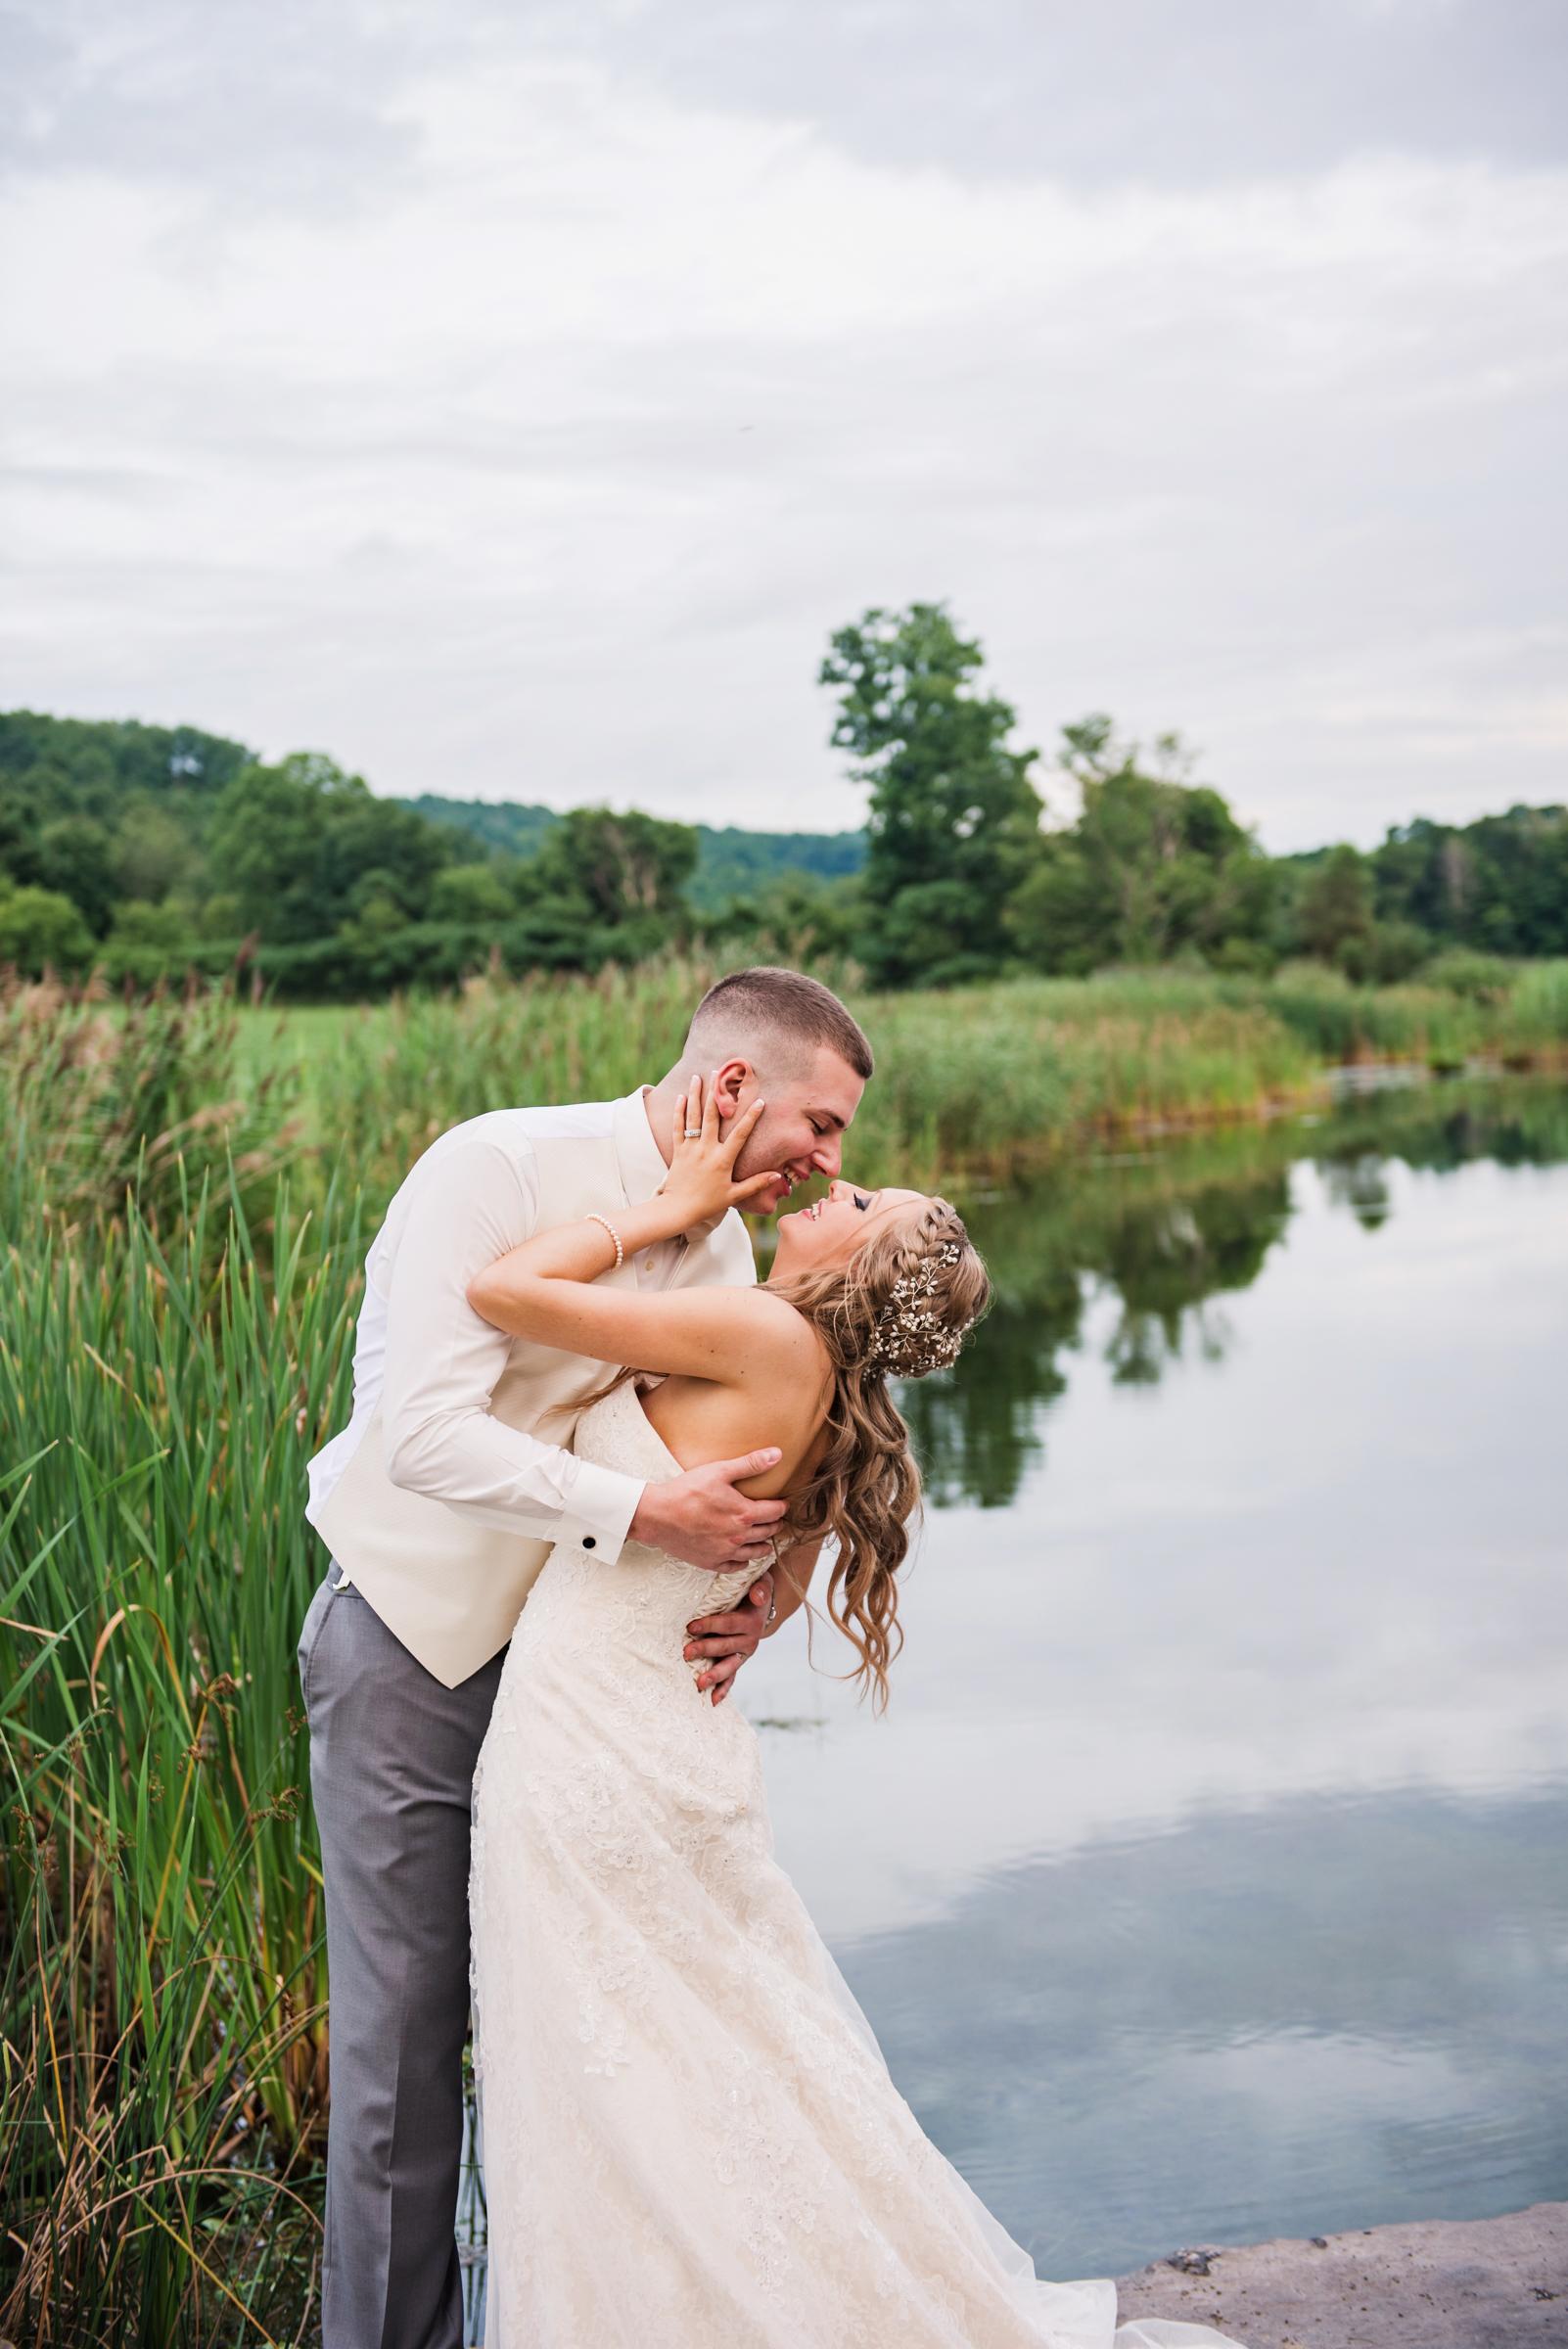 Wolf_Oak_Acres_Central_NY_Wedding_JILL_STUDIO_Rochester_NY_Photographer_DSC_8993.jpg